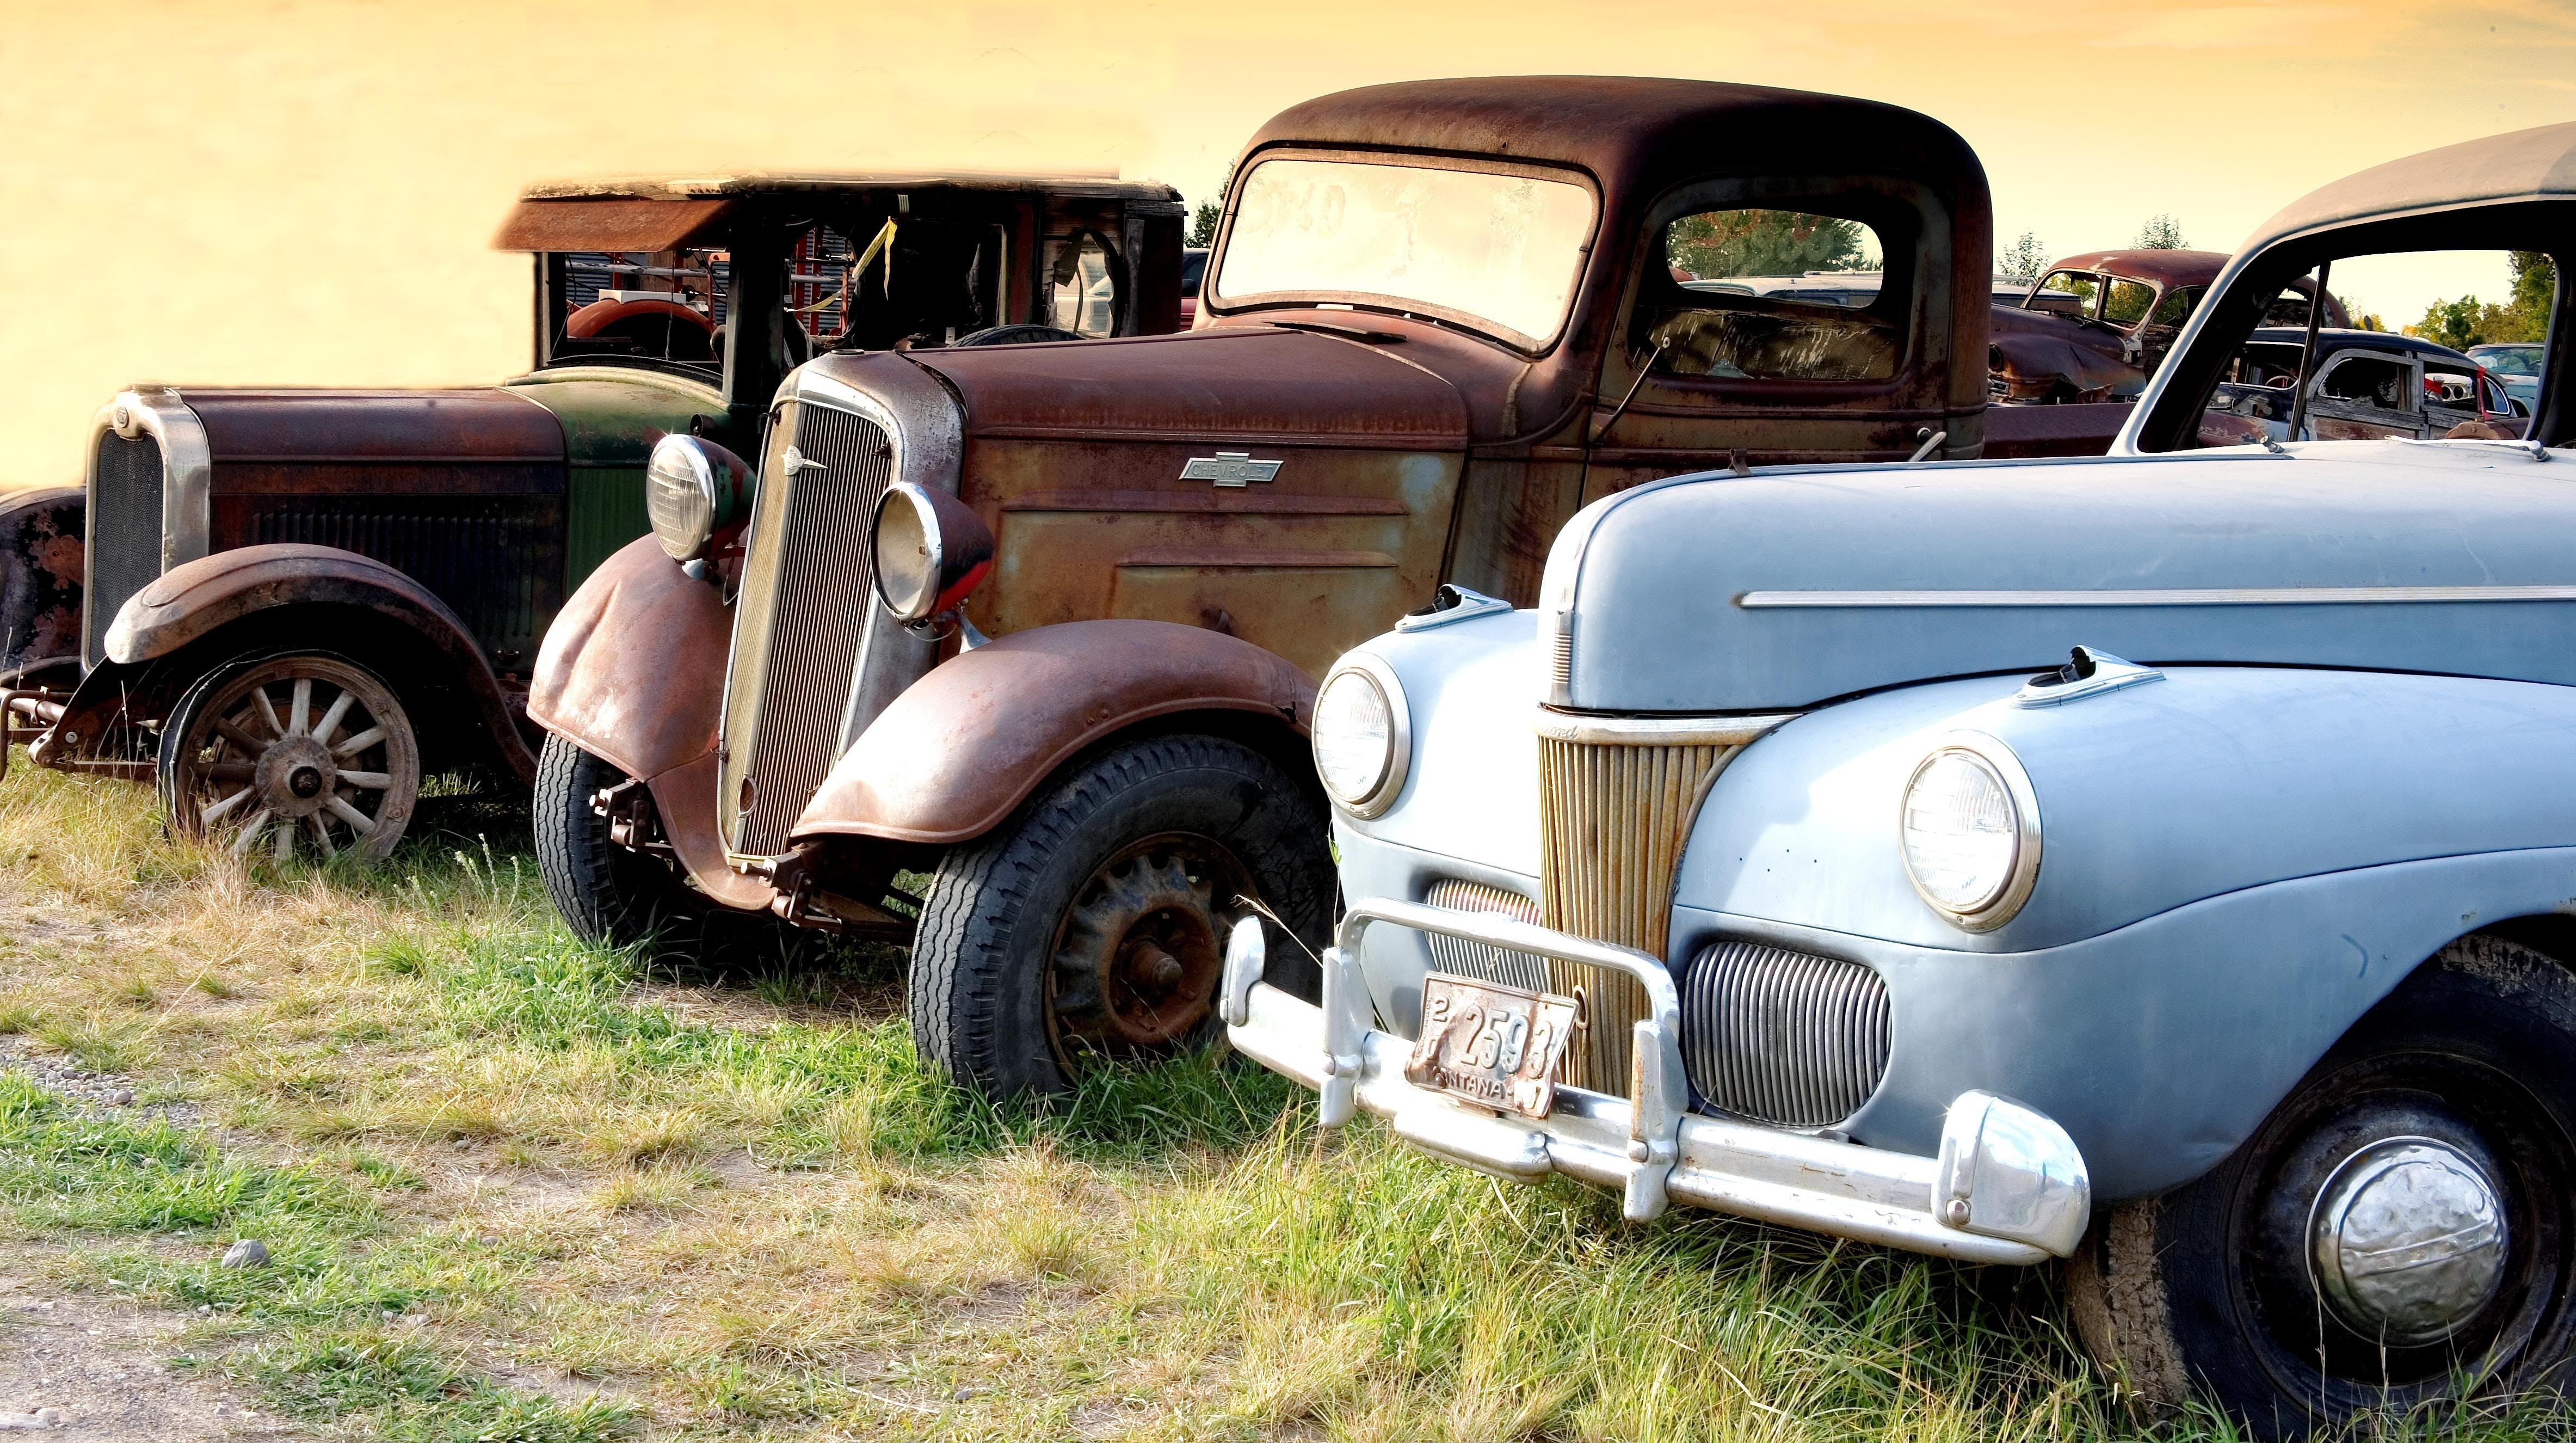 Free stock photo of vehicle, usa, america, truck